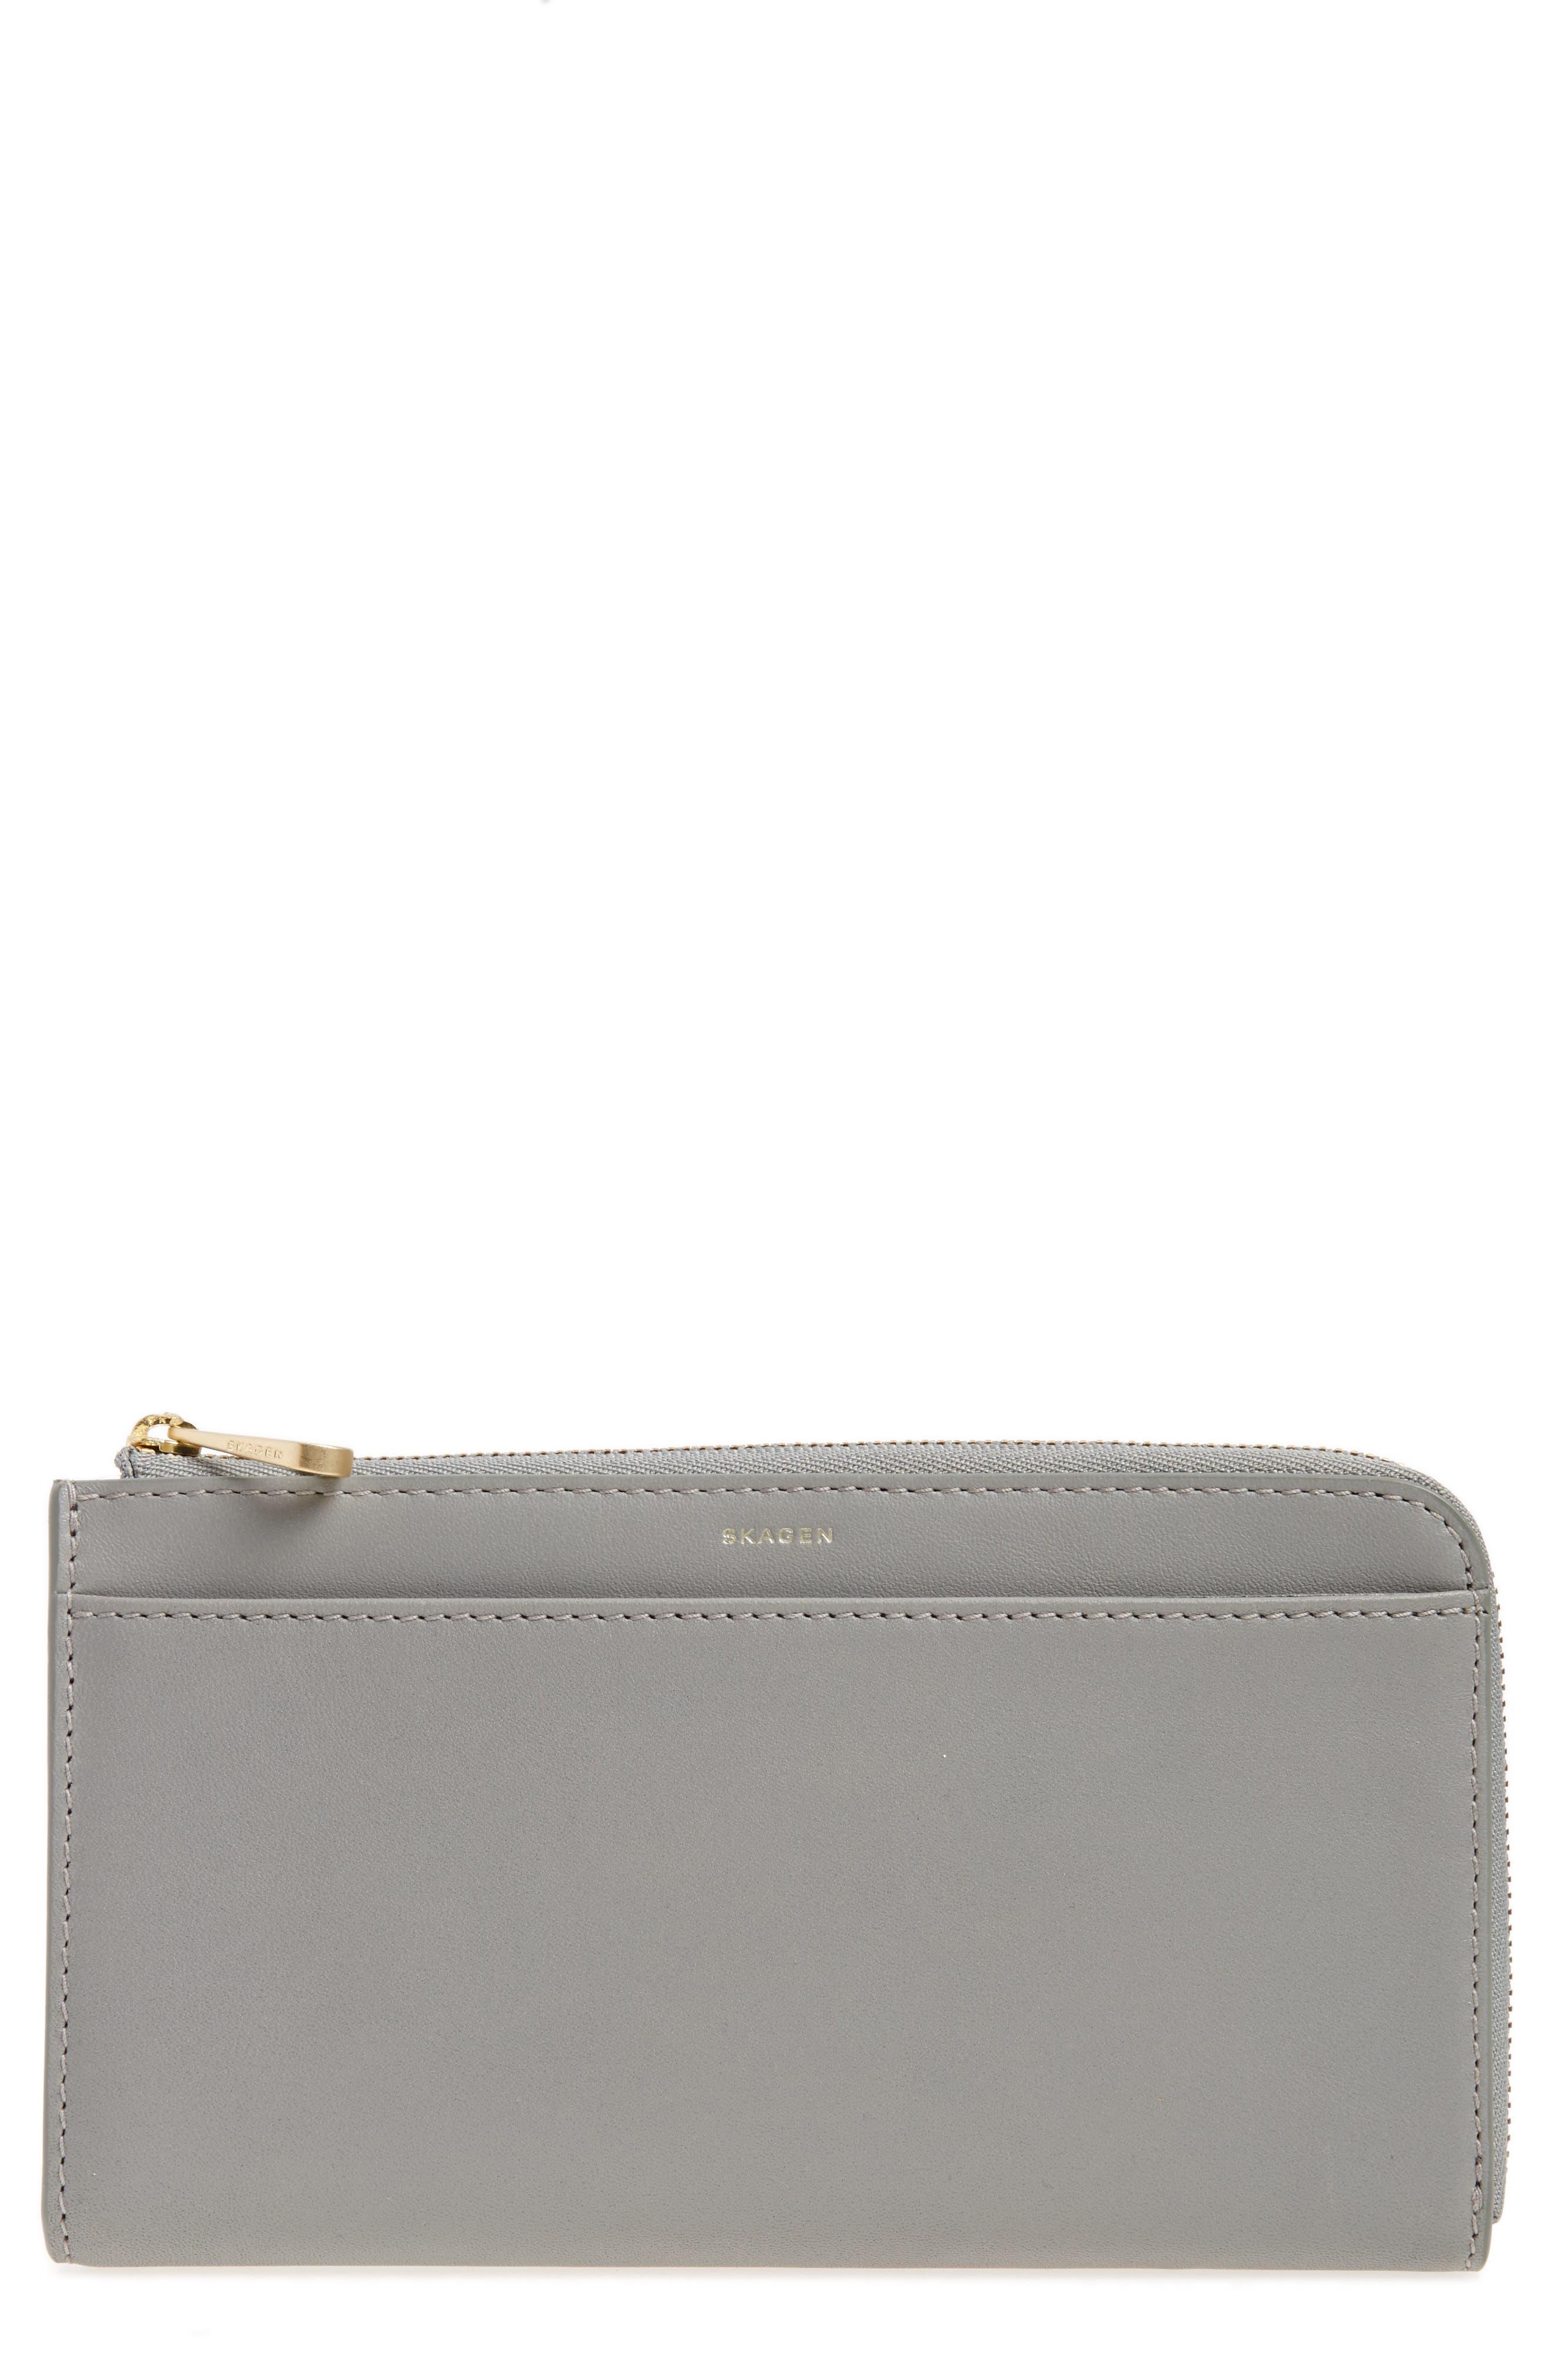 Leather Phone Wallet,                         Main,                         color, Light Ash